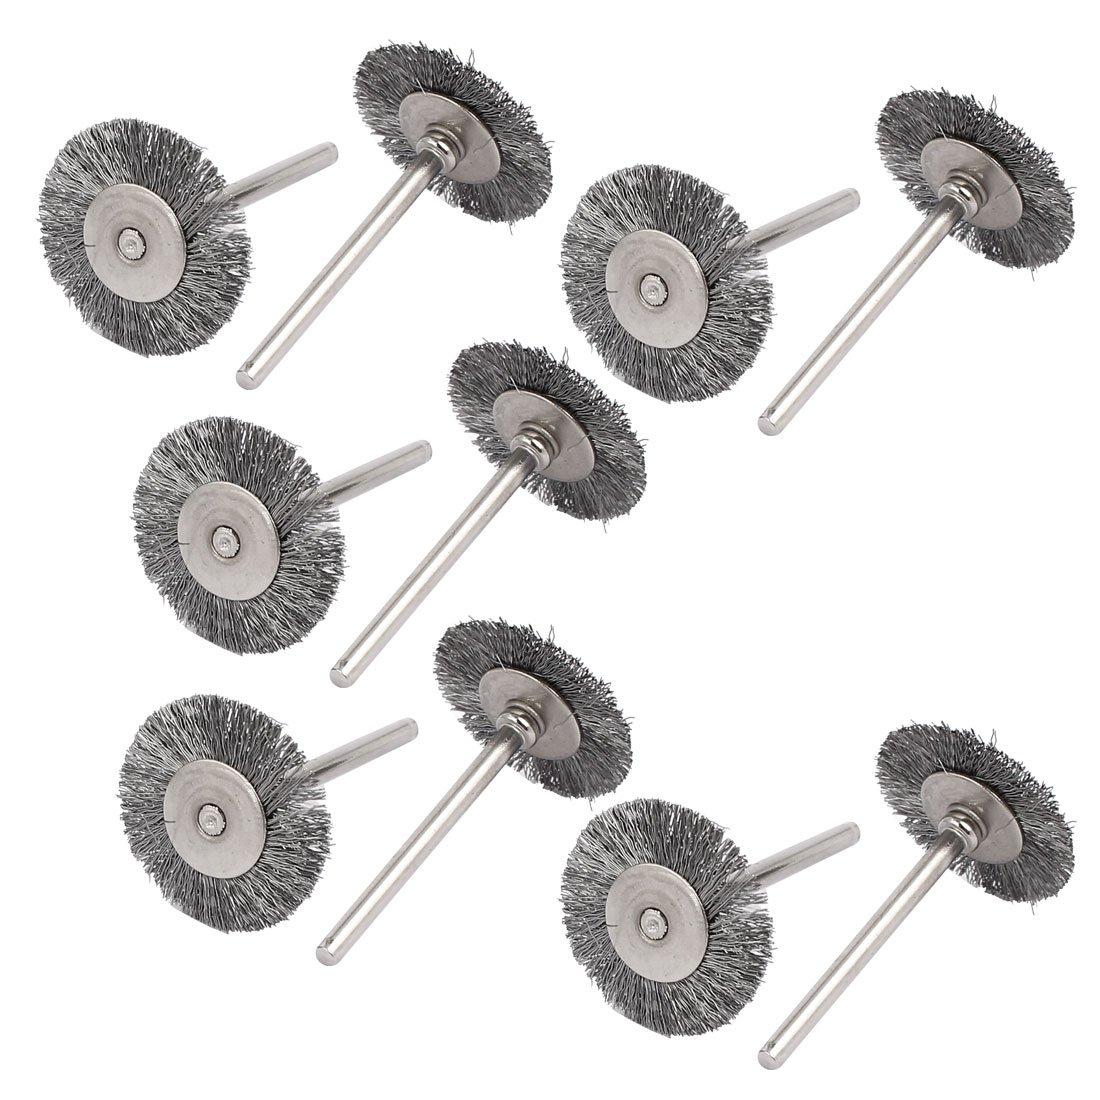 sourcingmap® Steel Wire Wheel Brush Polishing Rotary Tool 25mm Dia 10pcs US-SA-AJD-186590